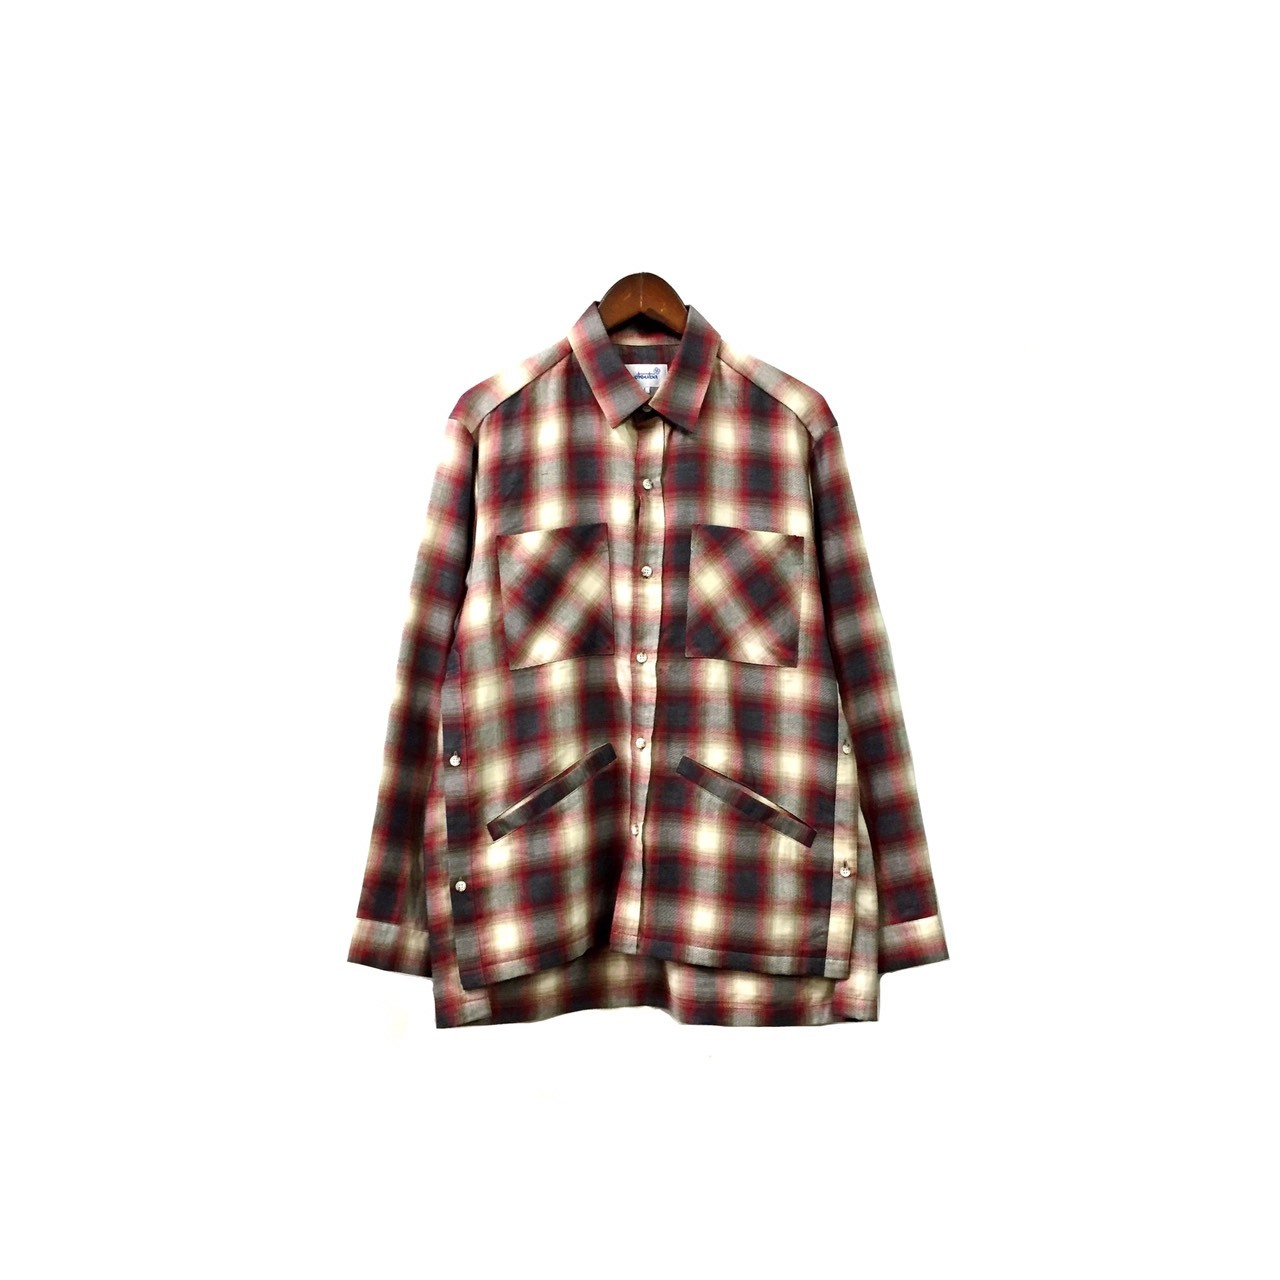 yotsuba - Cotton & Rayon Check Shirt / Red ¥22000+tax